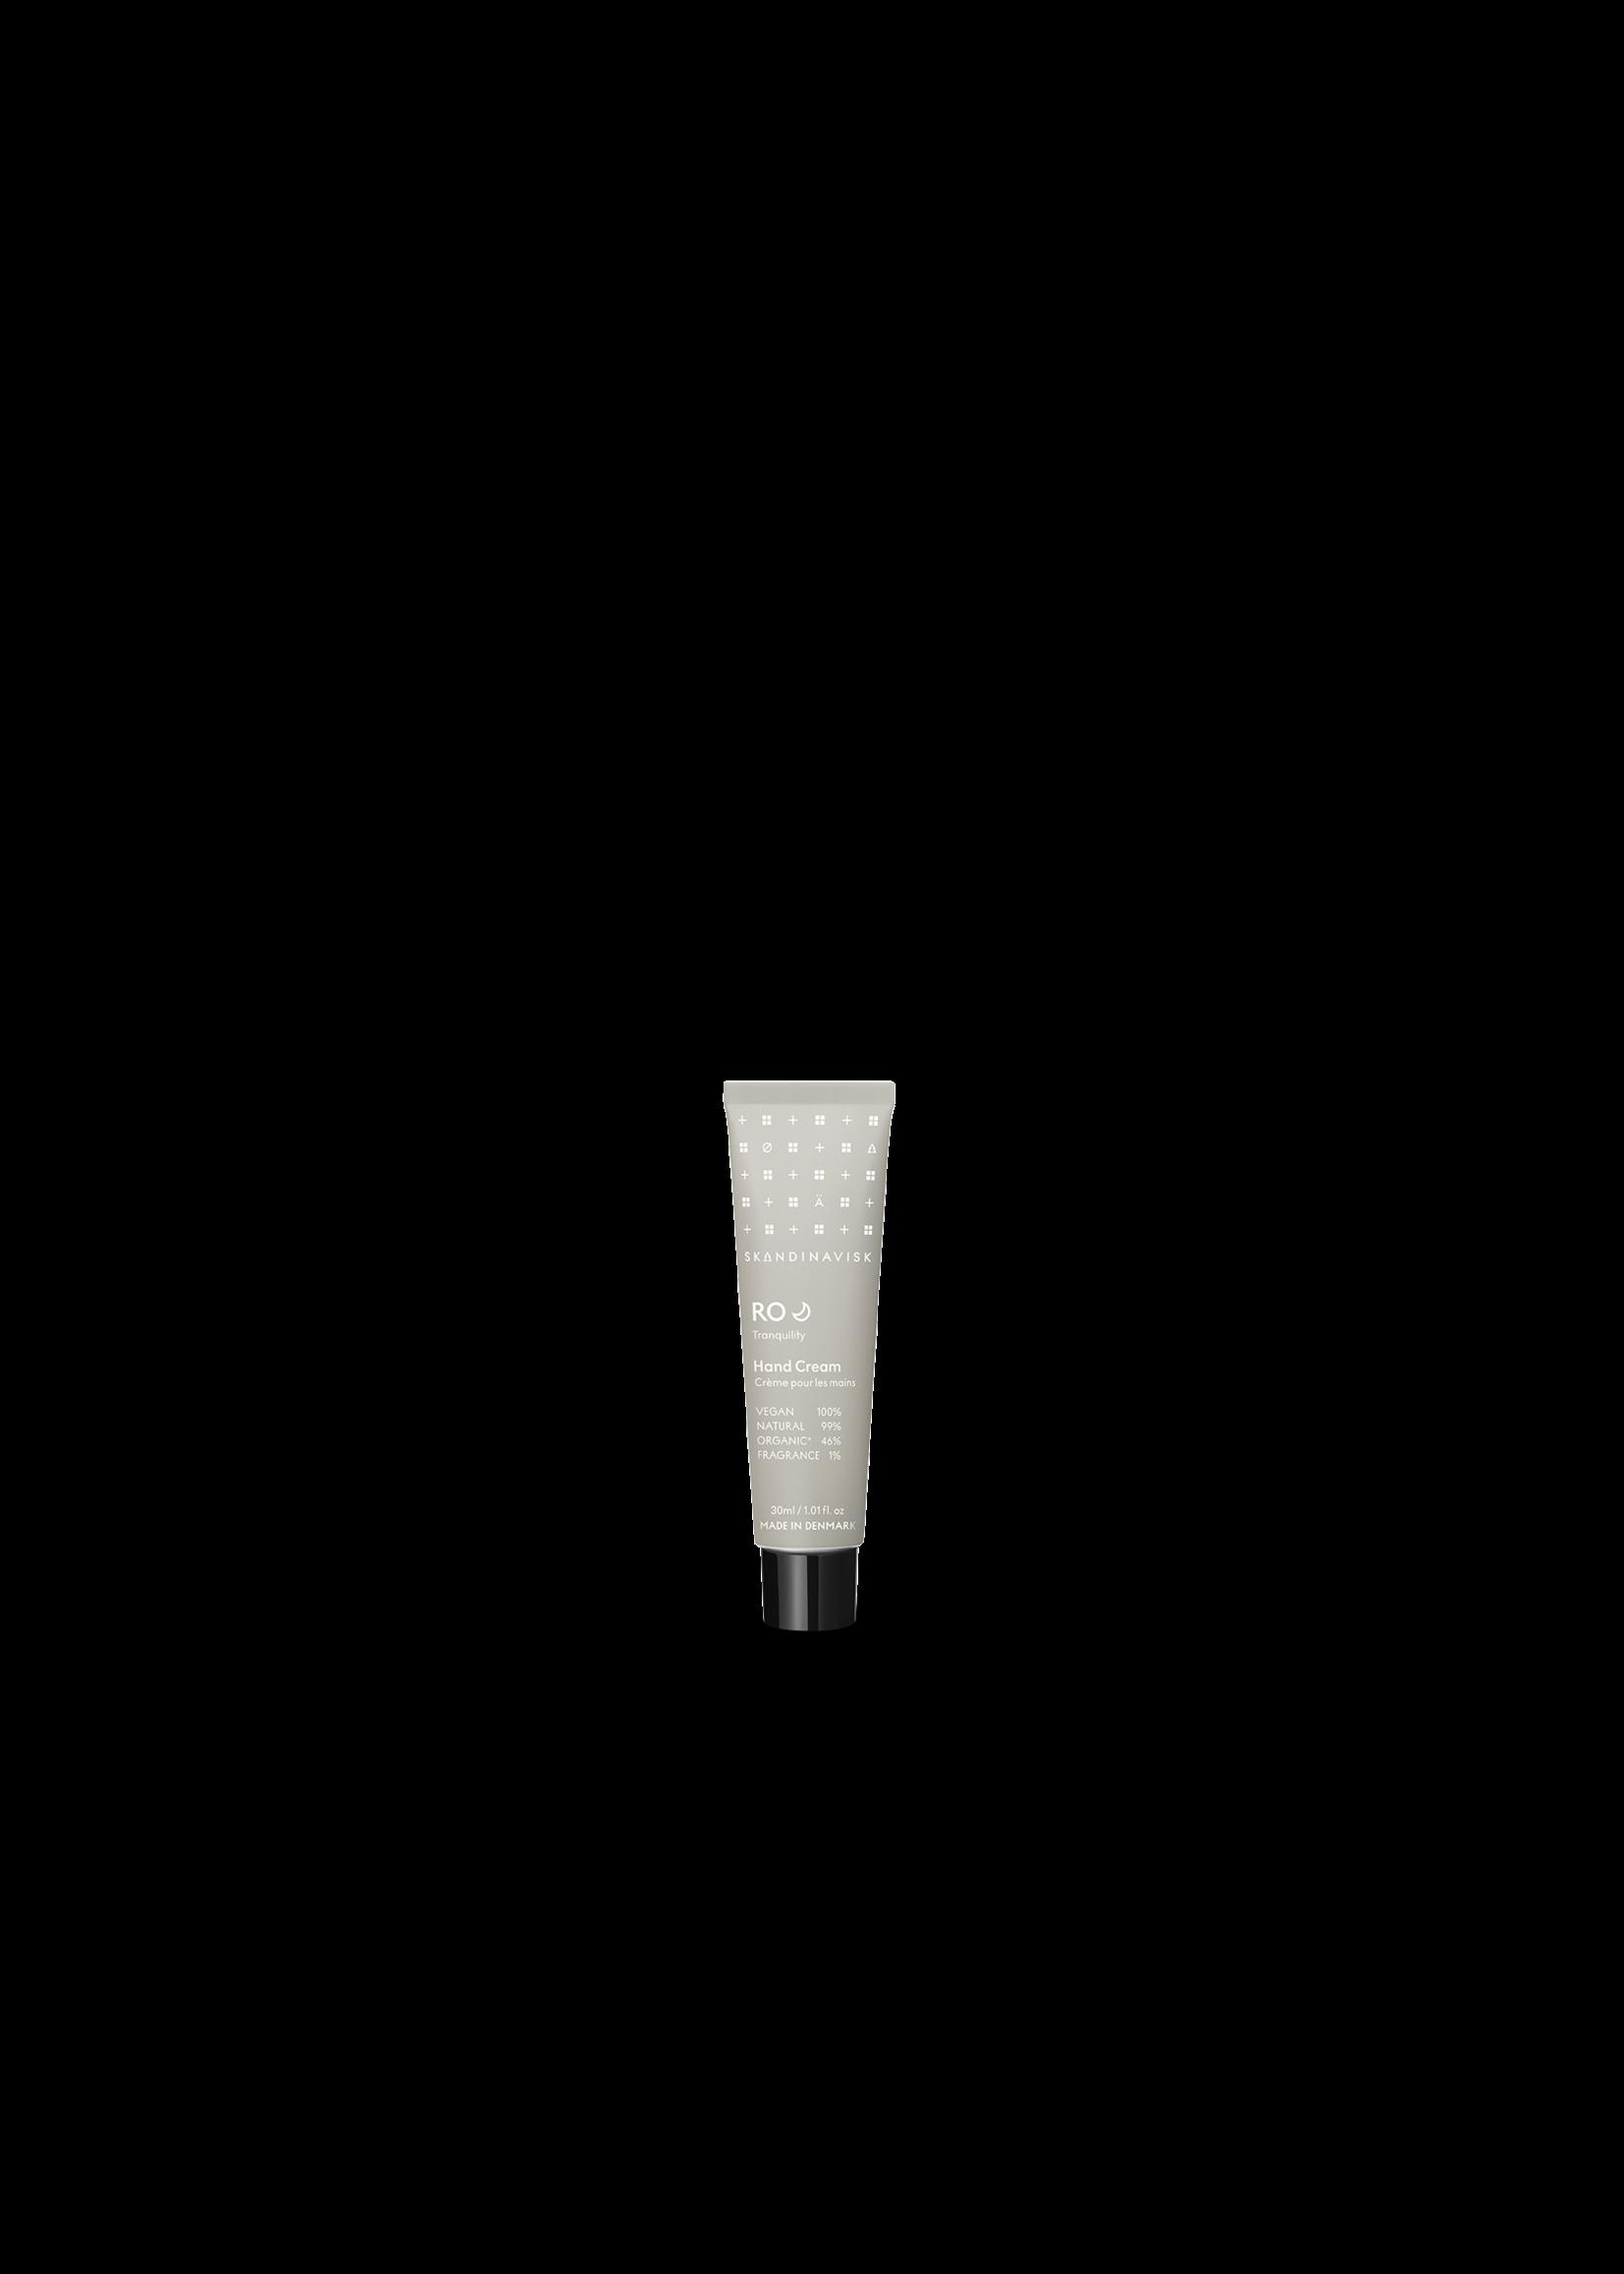 SKANDINAVISK Skandinavisk RO Mini Hand Cream